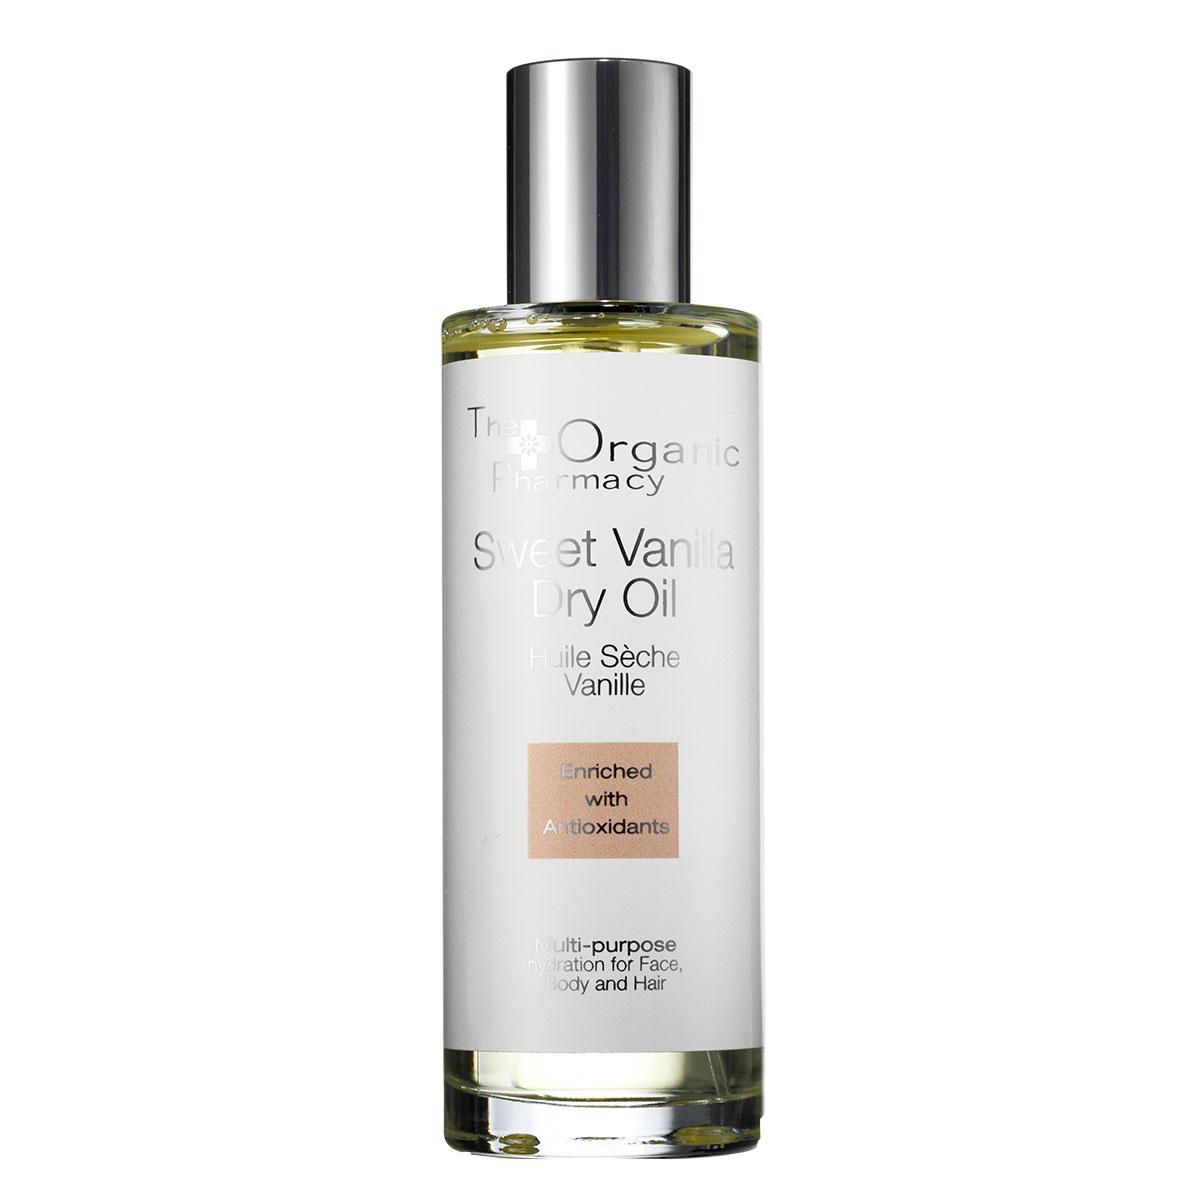 Billede af The Organic Pharmacy Sweet Vanilla Dry Body Oil - 100 ml